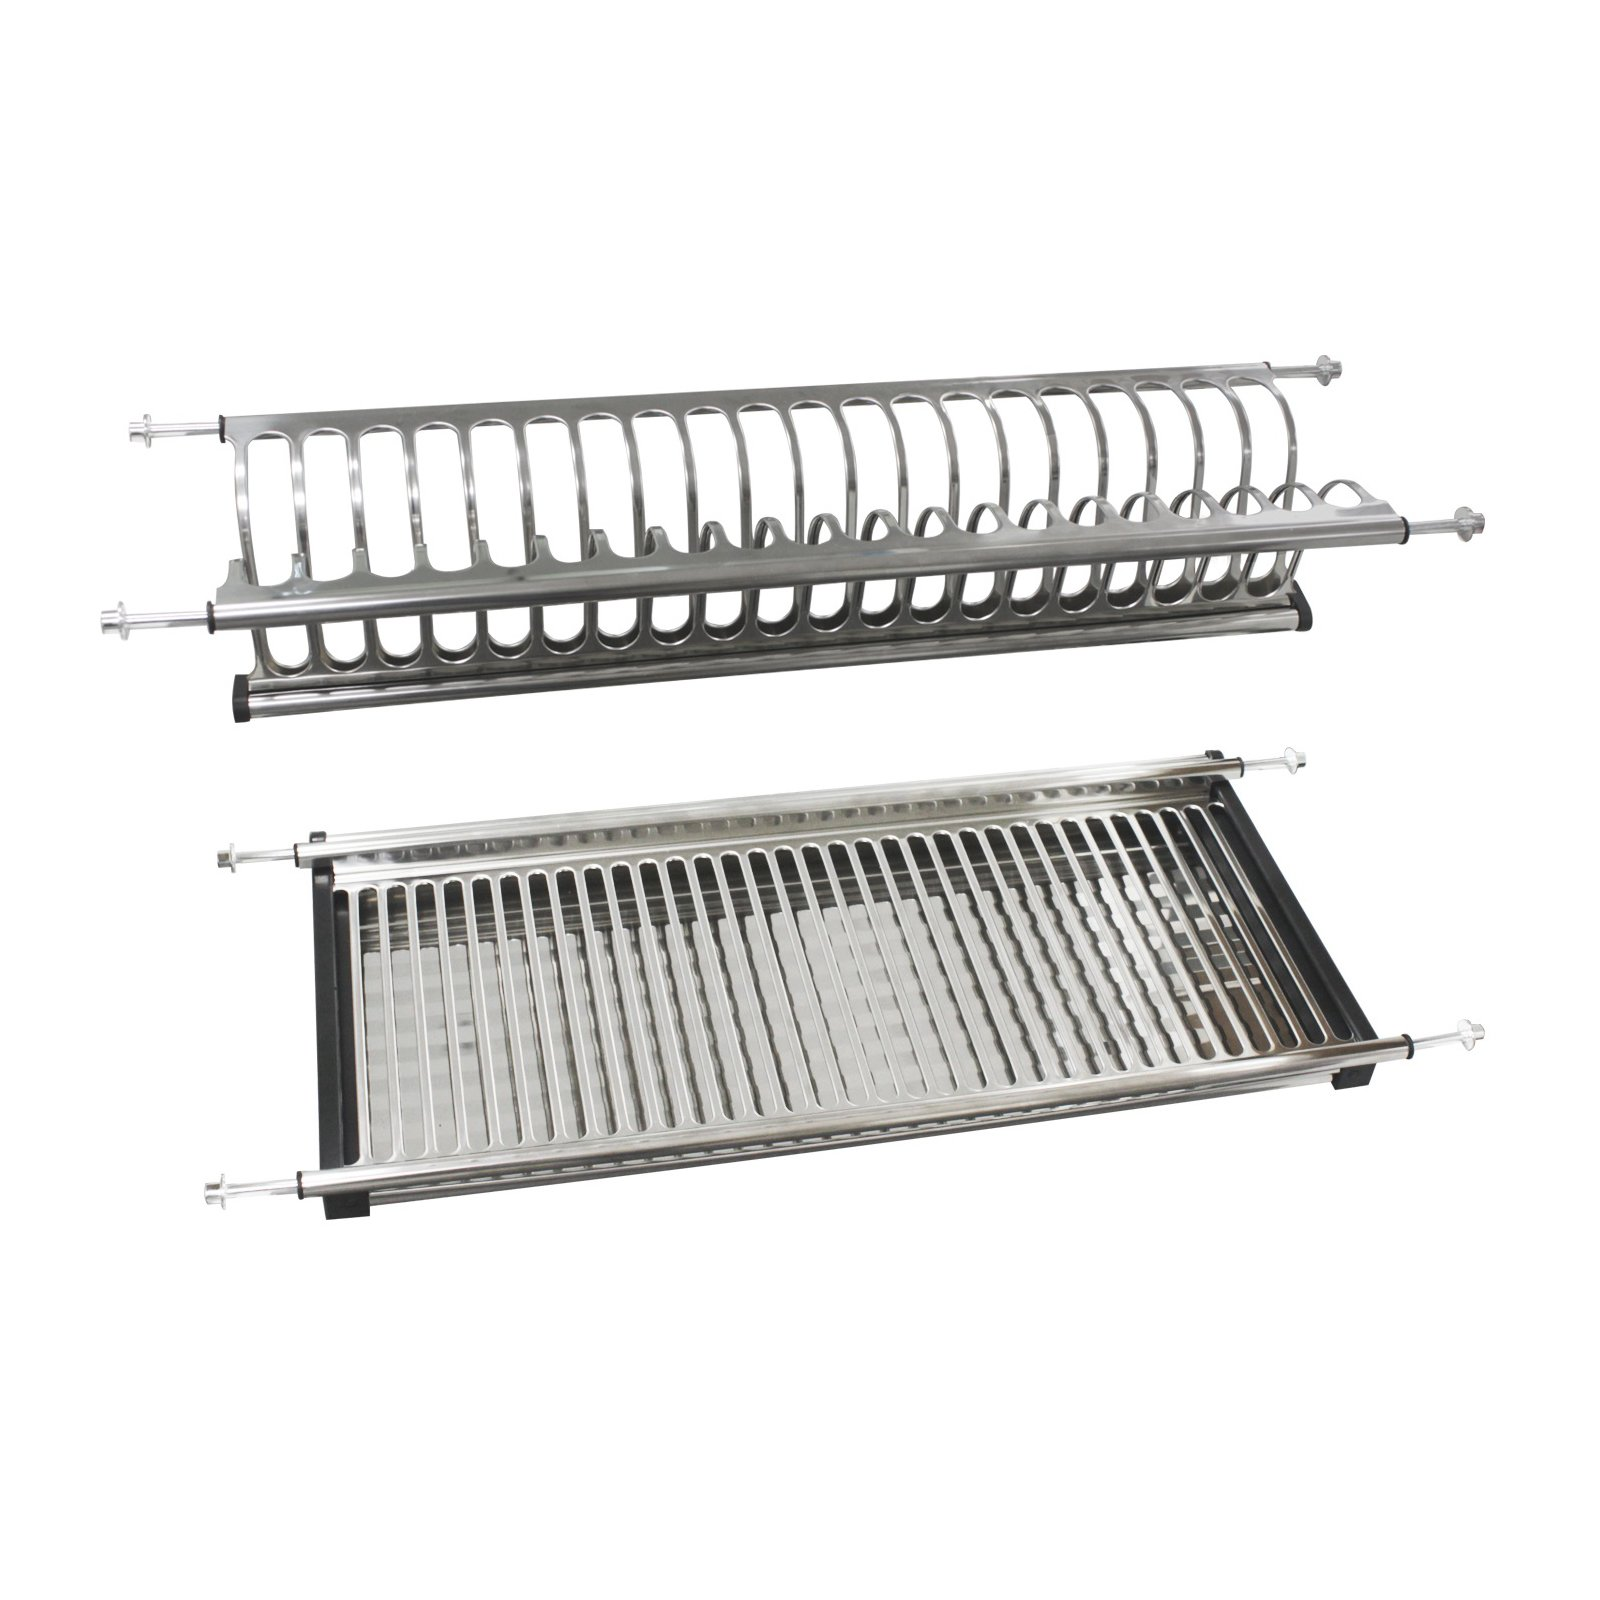 31.5'' Modern 2-Tier Kitchen Folding Dish Drying Dryer Rack For Cabinet Stainless Steel Drainer Plate Bowl Storage Organizer Holder